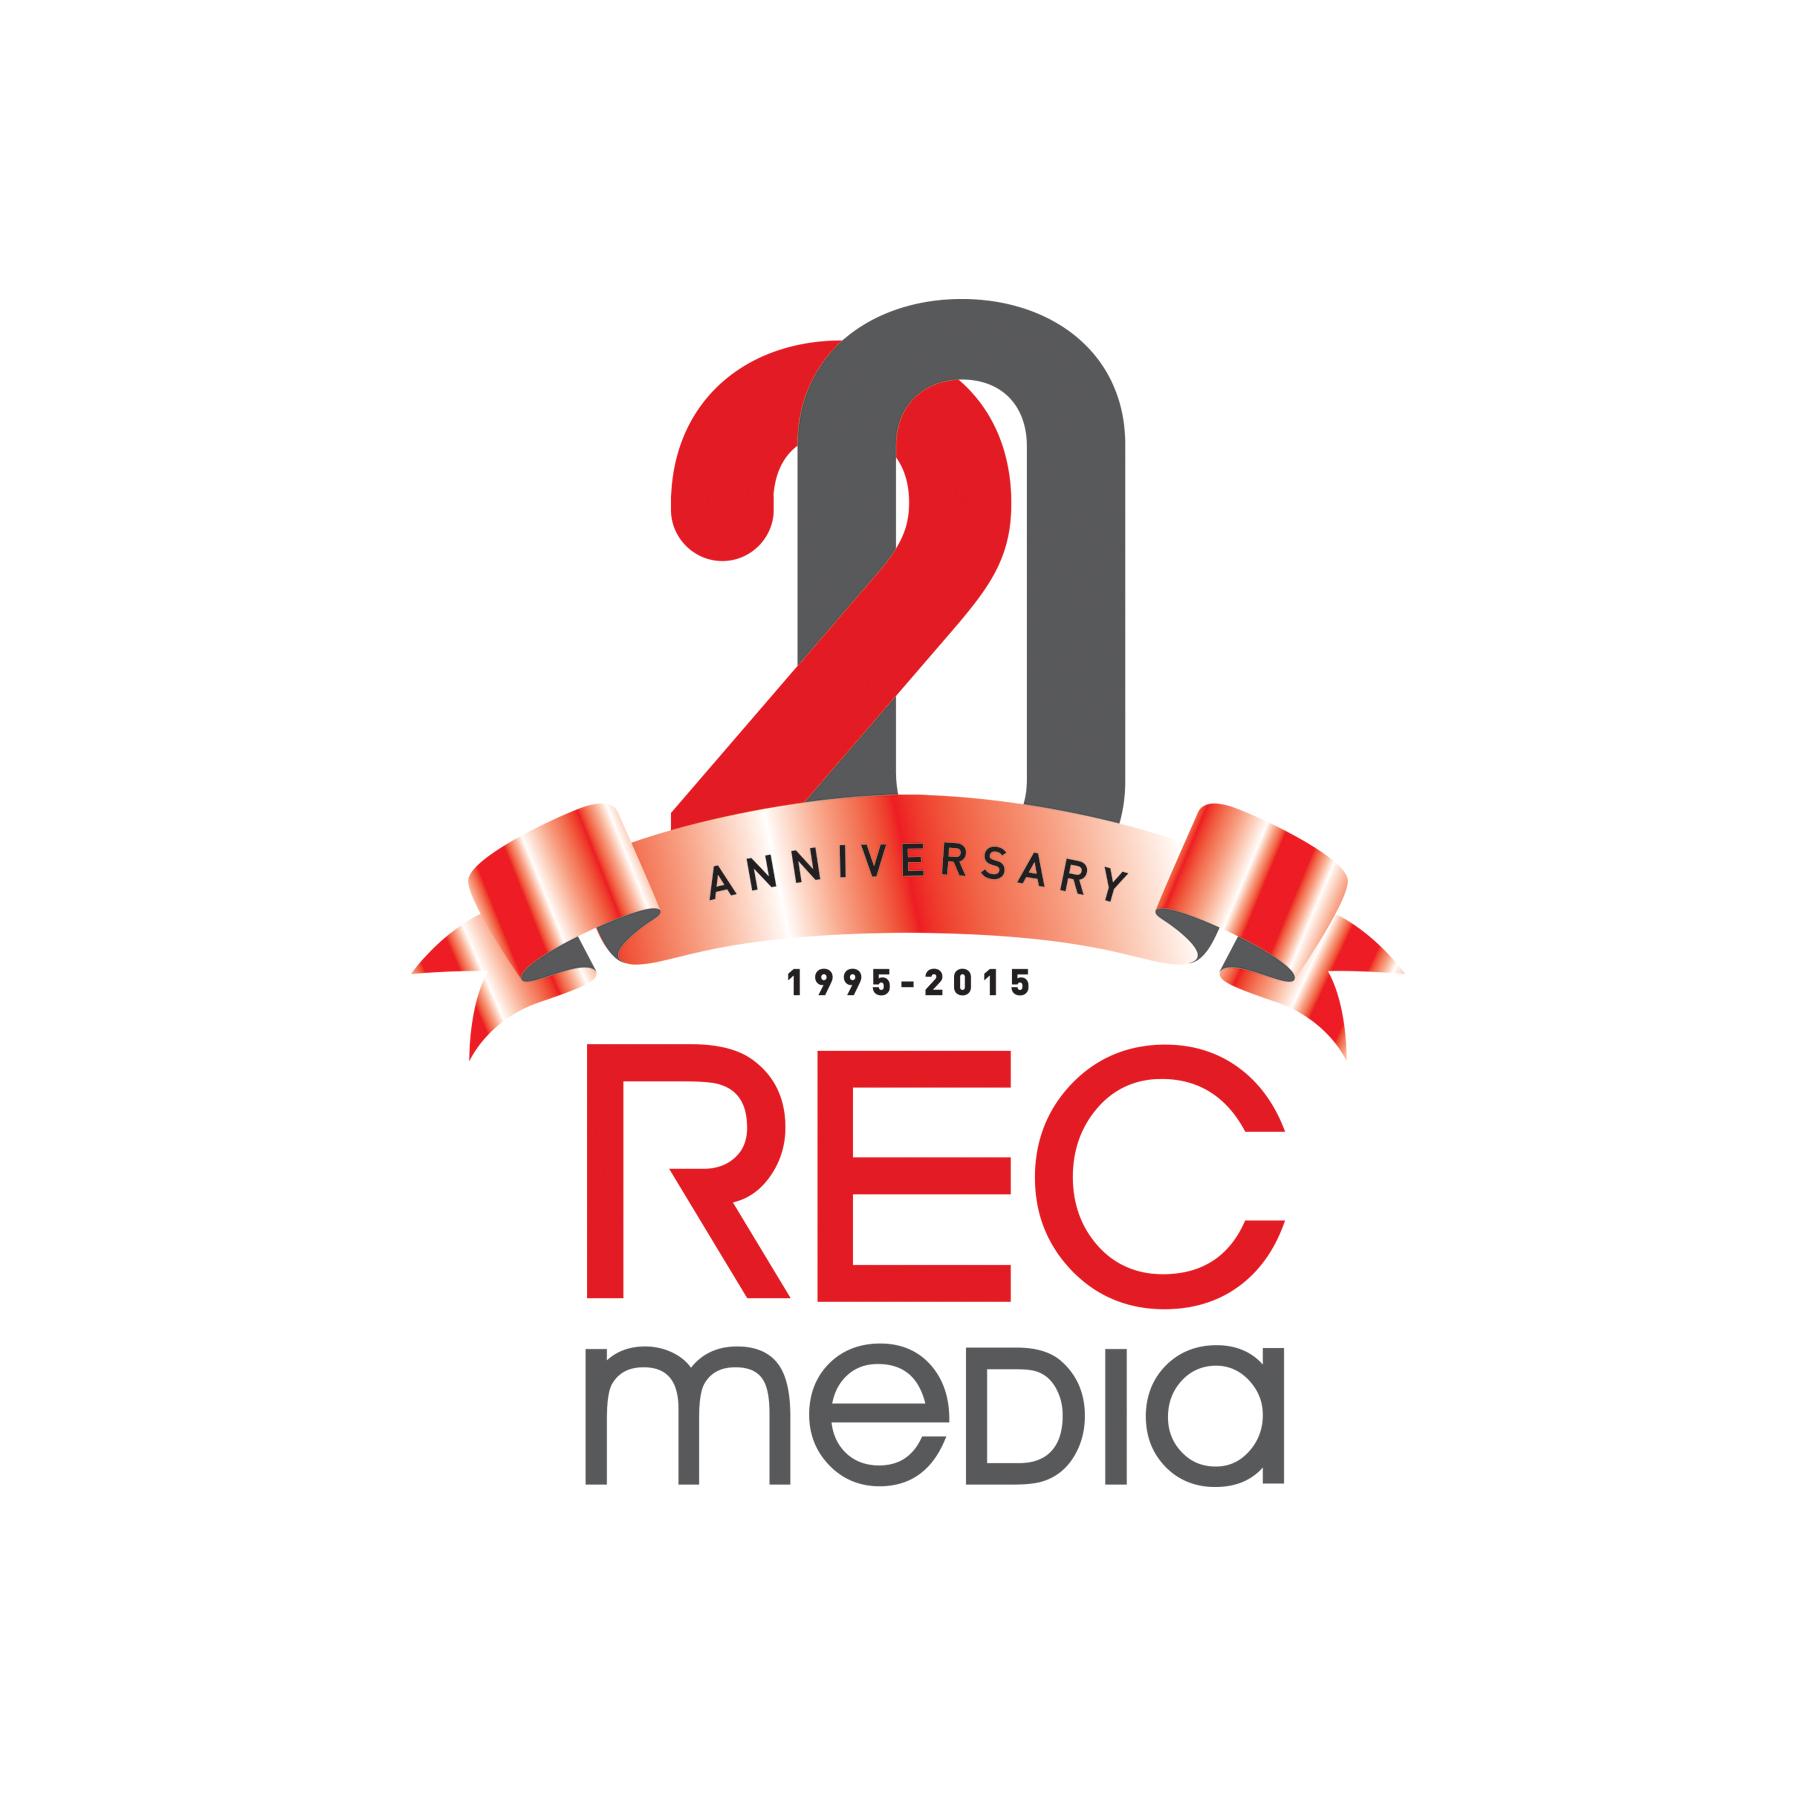 Logo Design by DAMIR JAHIC - Entry No. 75 in the Logo Design Contest REC Media Logo Design.